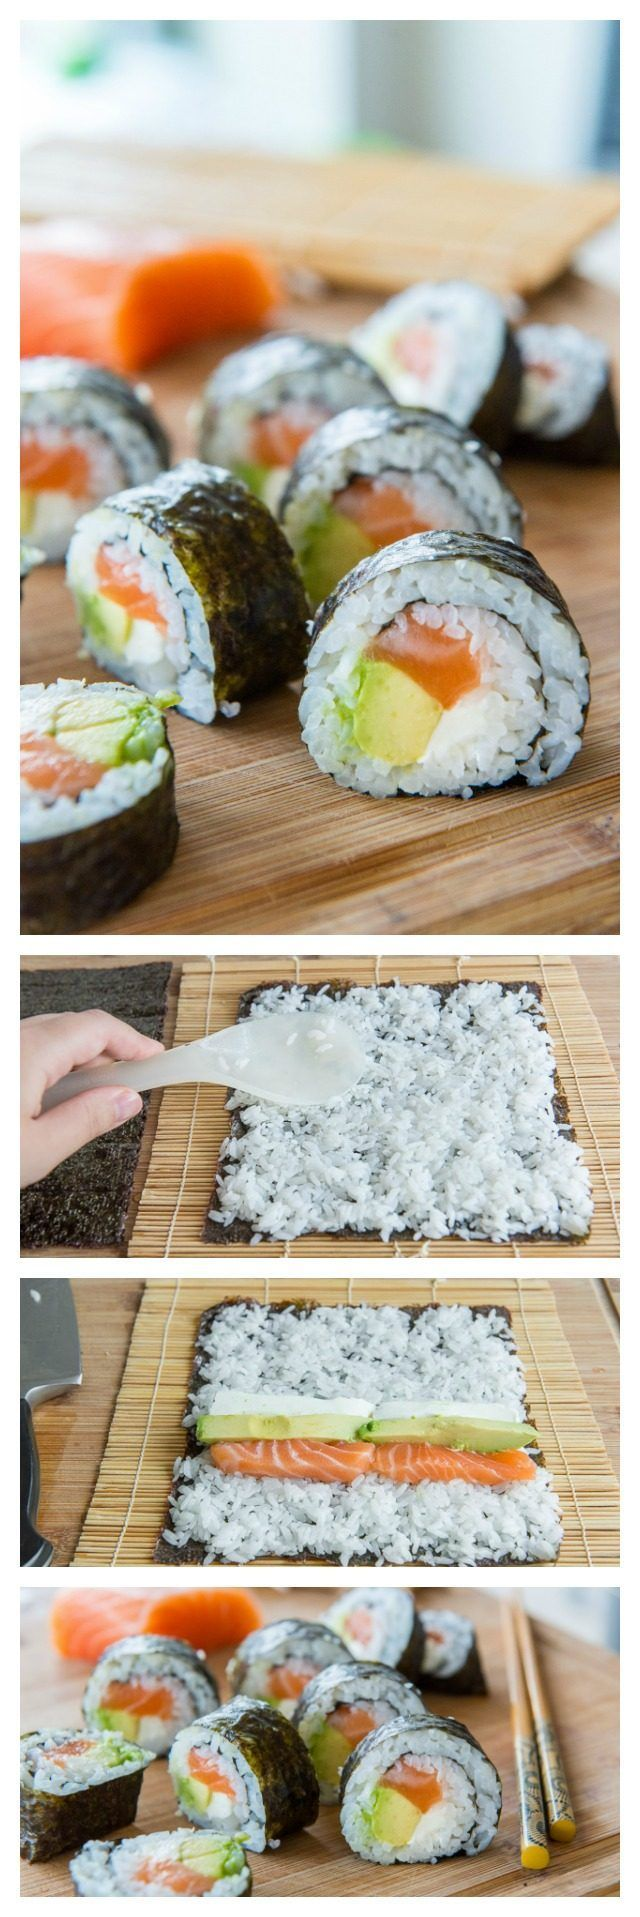 All Things Savory: Homemade Sushi